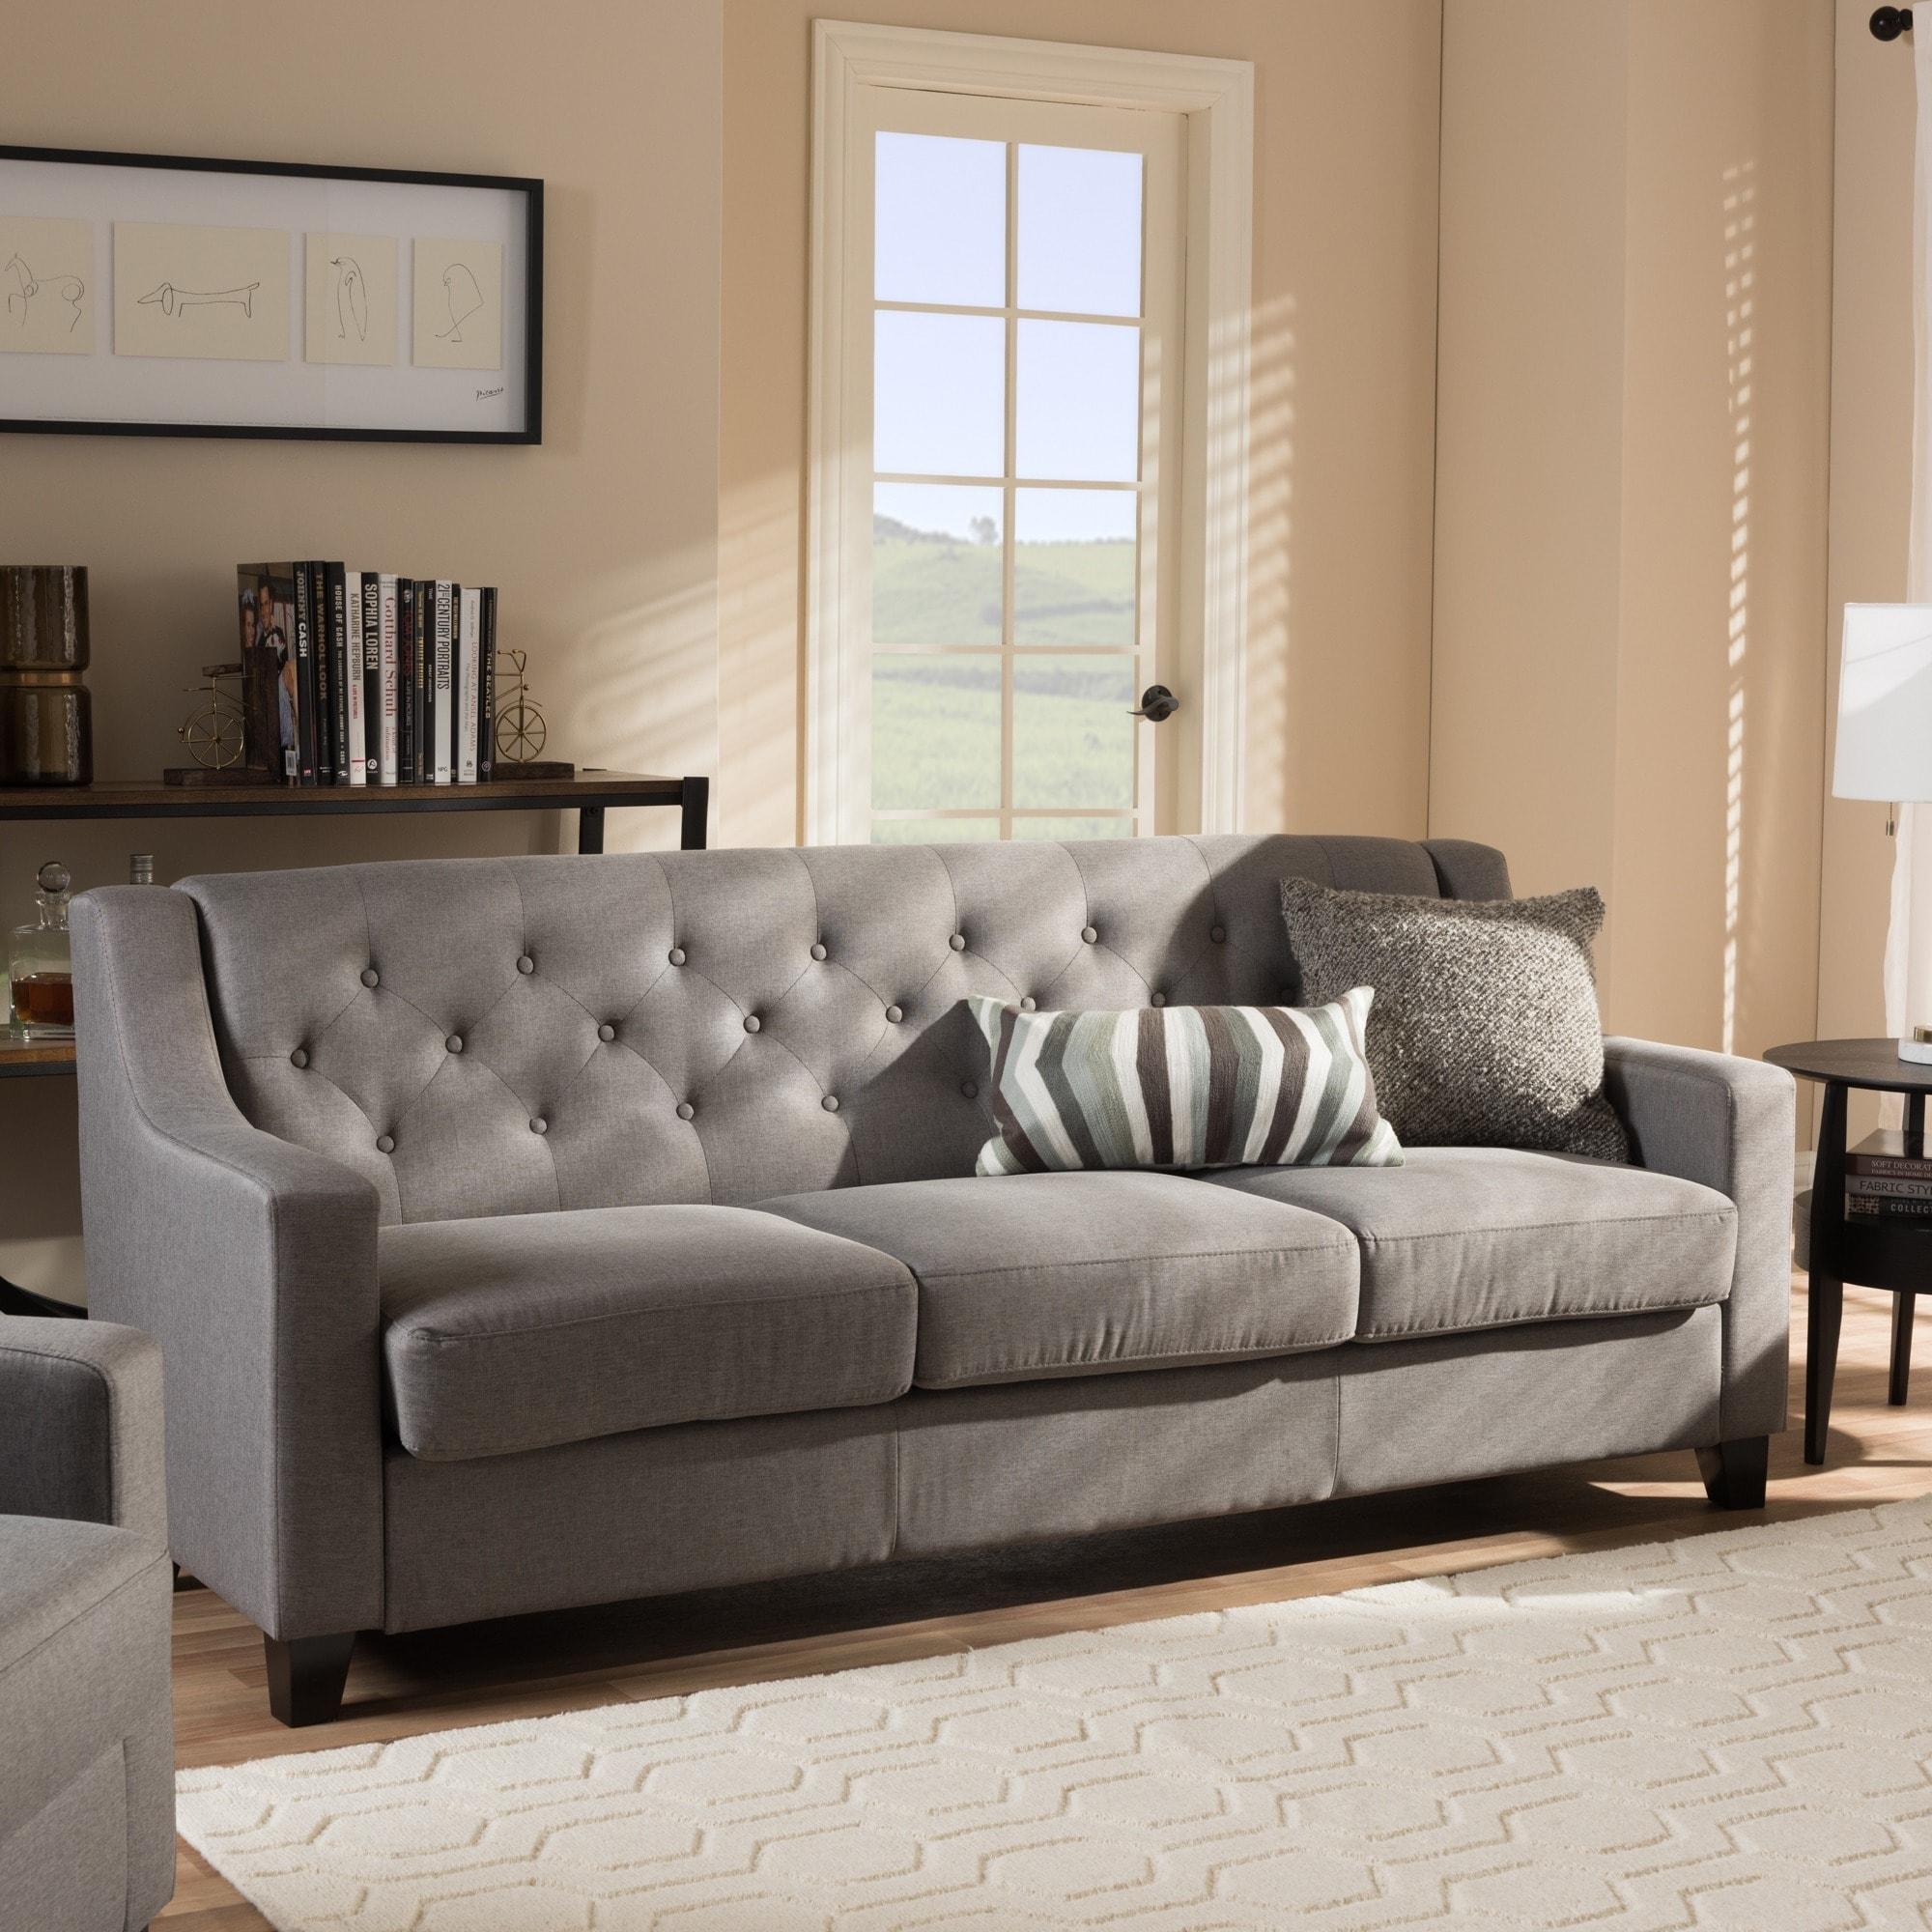 shop copper grove muir modern and contemporary tufted sofa free rh overstock com Small Tufted Sofa Small Tufted Sofa